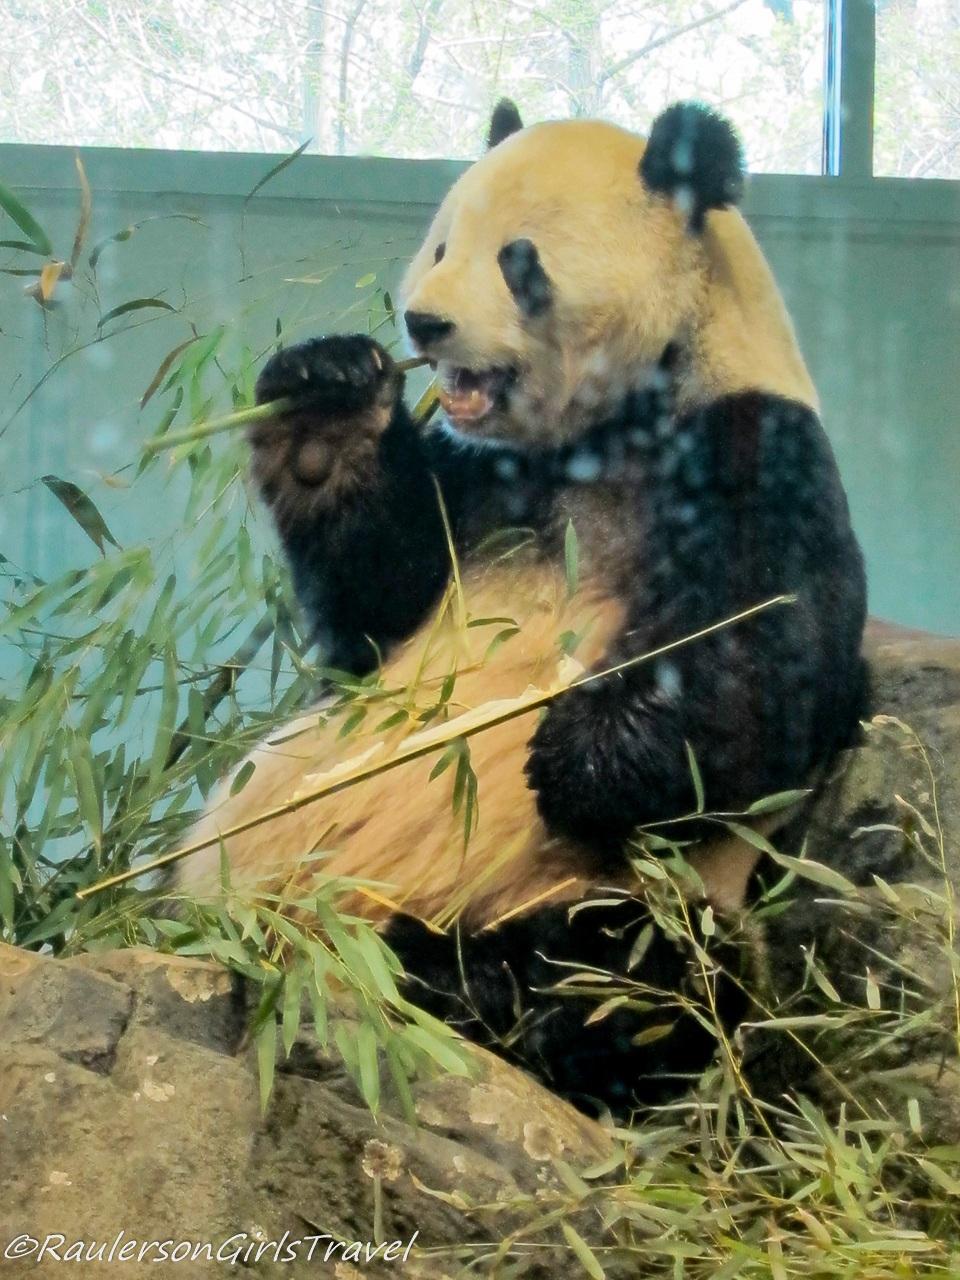 Giant Panda at Smithsonian Zoo